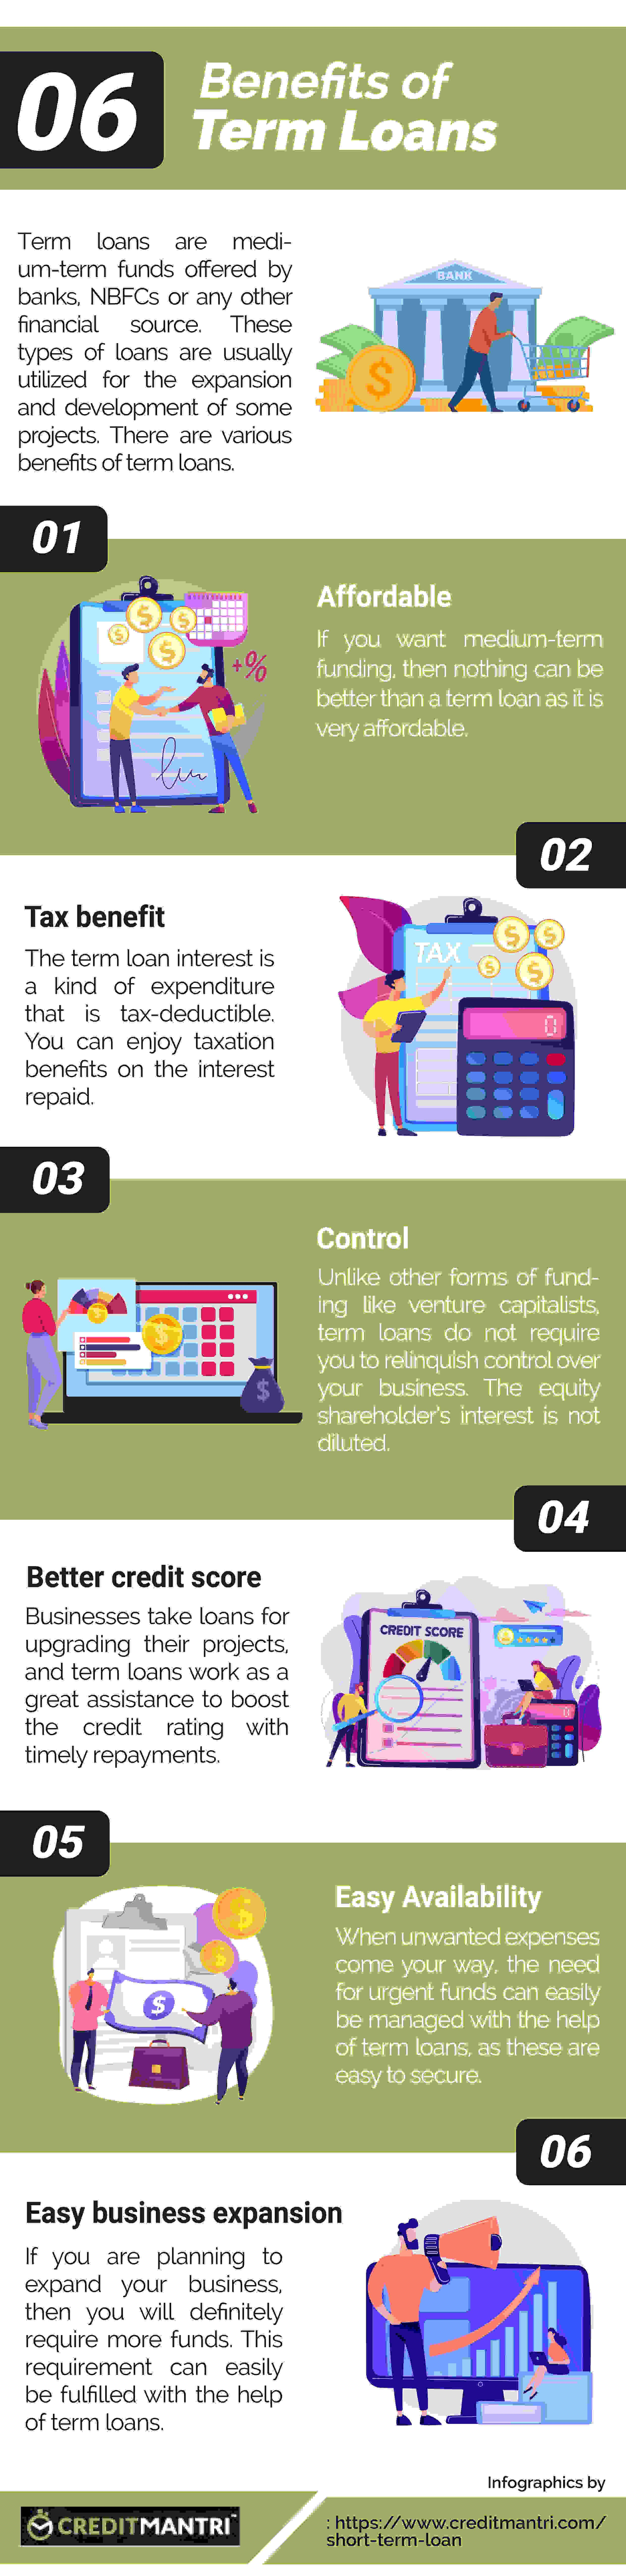 06 Benefits of Term Loans